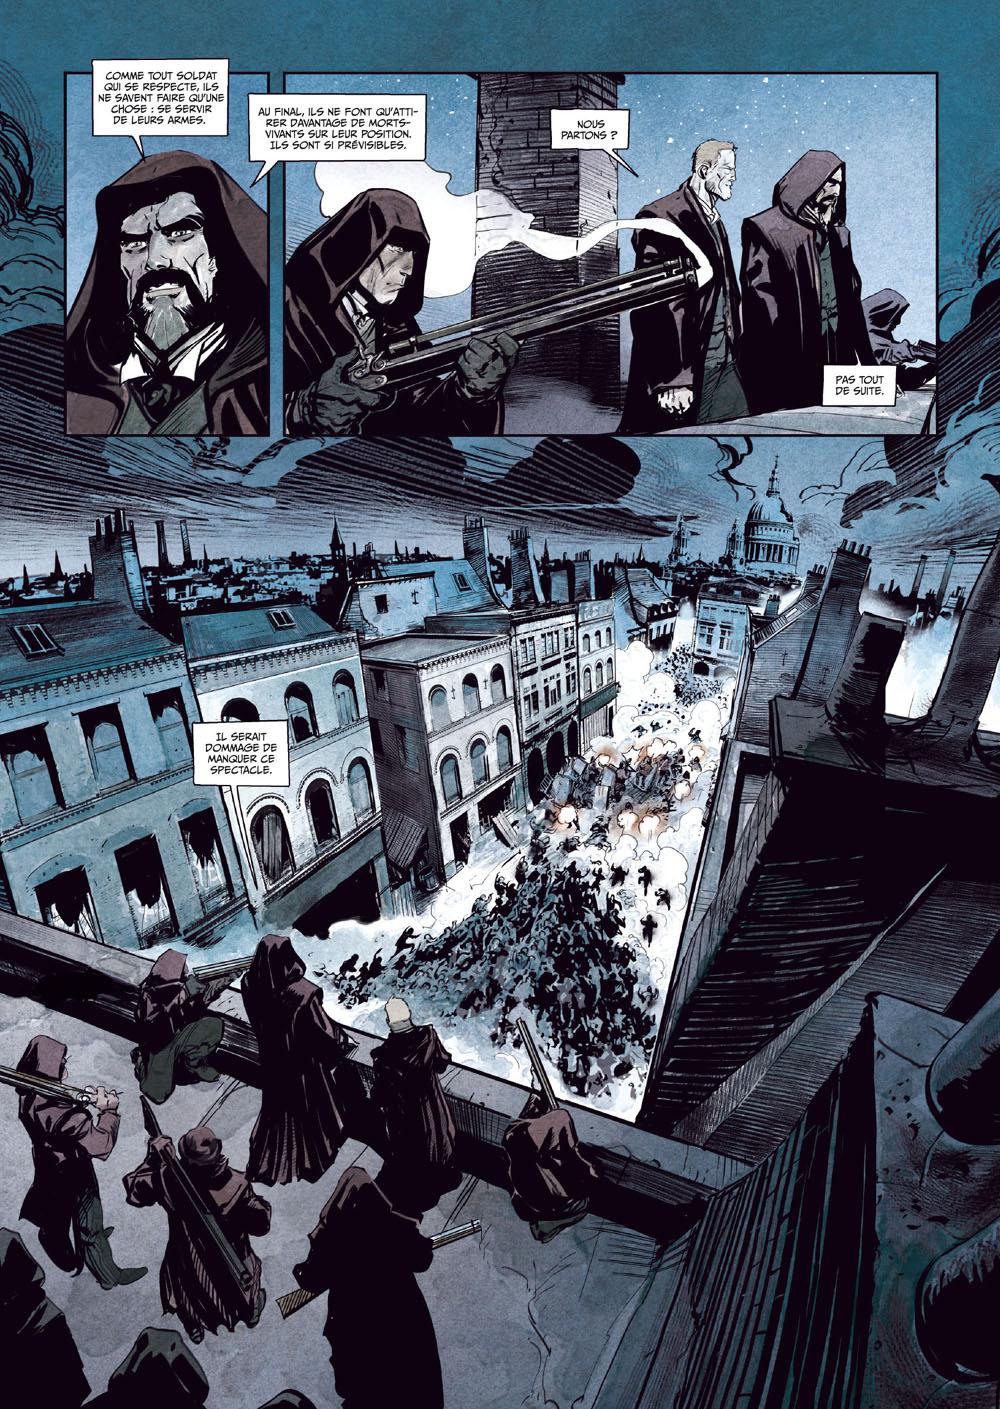 Sherlock Holmes Society, planche du tome 4 © Toulhoat / Cordurié / Gonzalbo